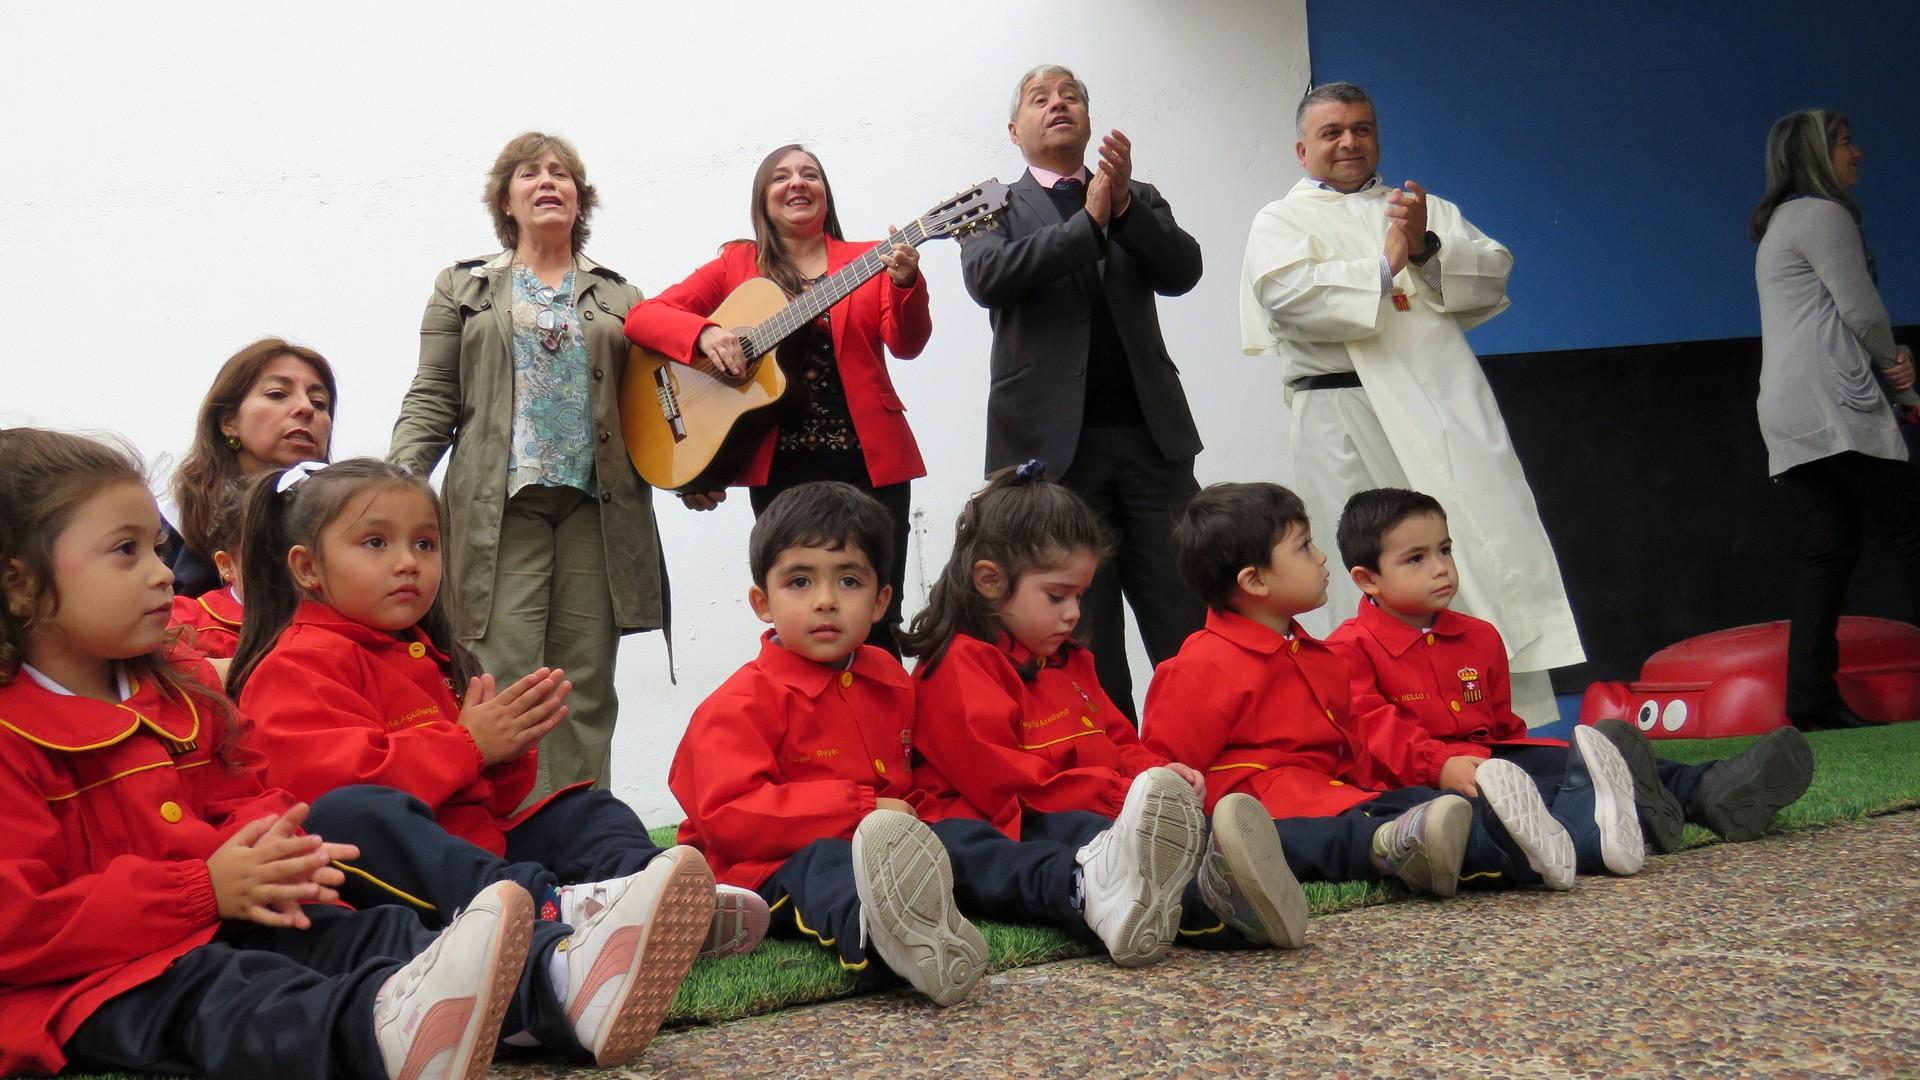 Colegio San Pedro Nolasco de Valparaíso - Playgroup